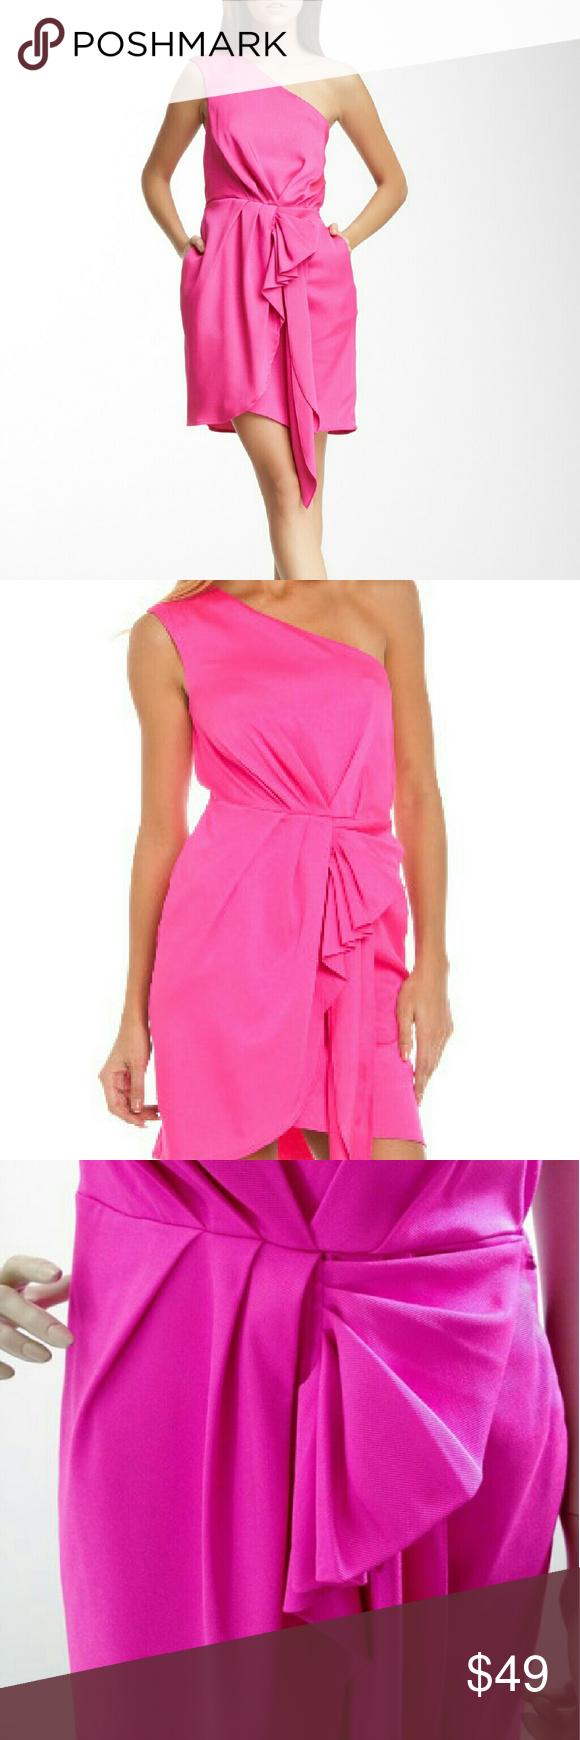 Bcbgeberation pink sheath dresses hot pink and hooks